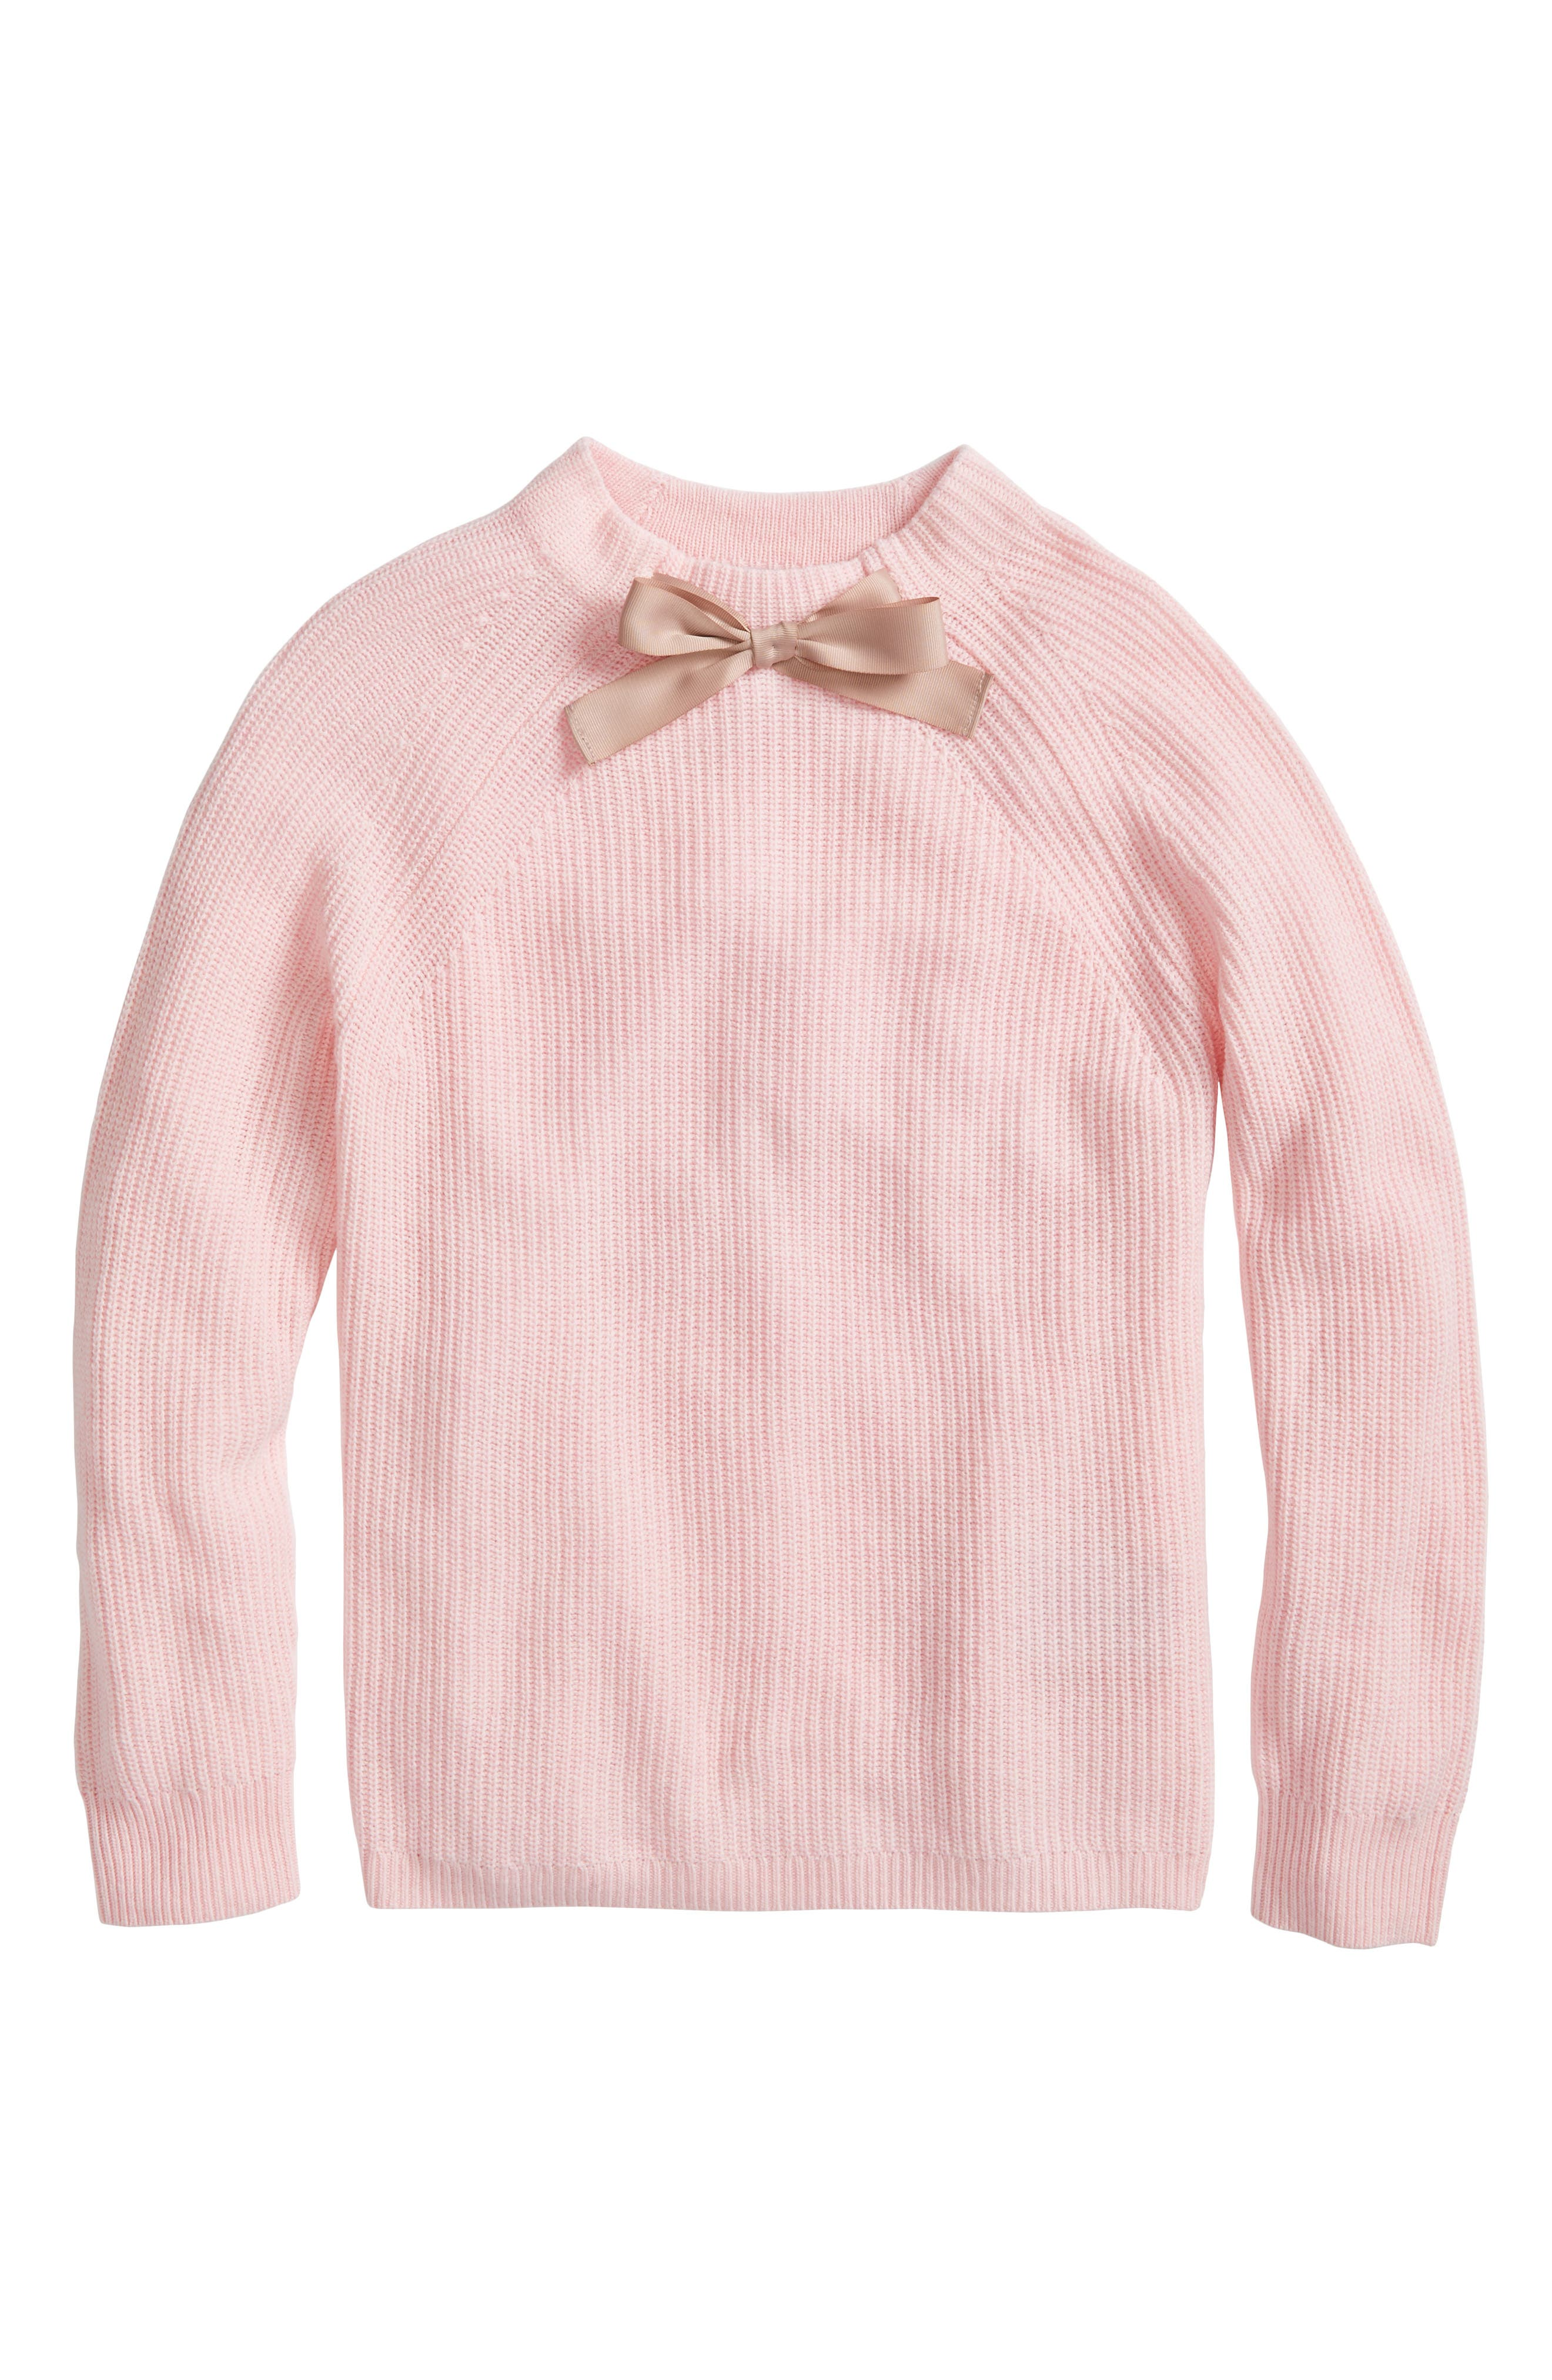 J.CREW,                             Gayle Tie Neck Sweater,                             Alternate thumbnail 6, color,                             650